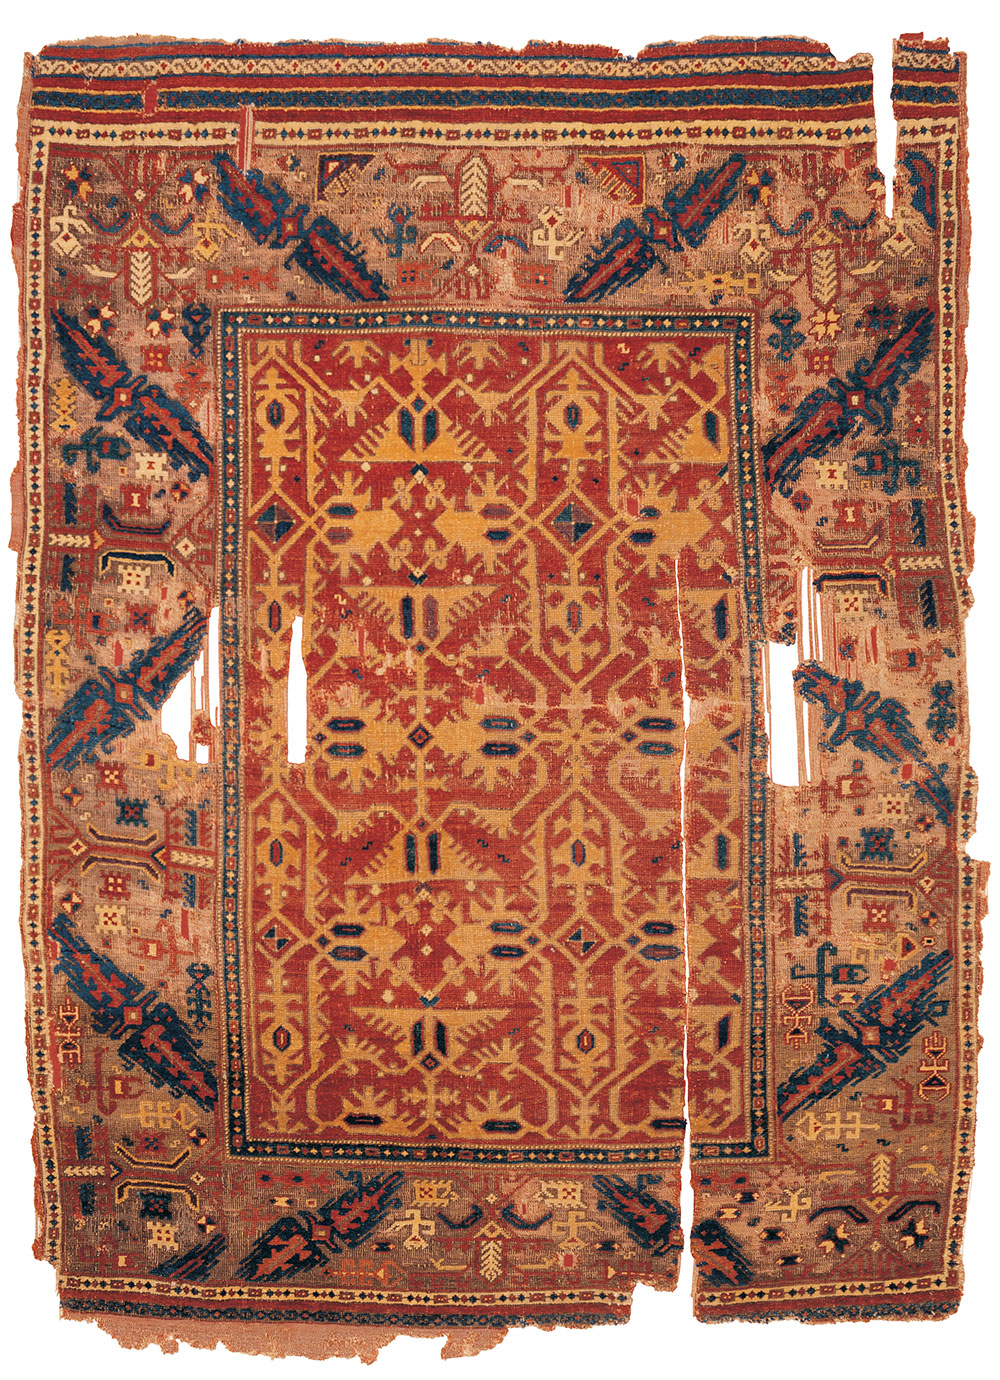 "The Alaeddin Keykubad Lotto rug (and border detail), Ladik region, central Anatolia, ca. 1550–1600. Wool pile on a wool foundation, 1.45 x 1.95 m (4' 9"" x 6' 5""). Museum of Turkish and Islamic Arts, Istanbul, no. 16"